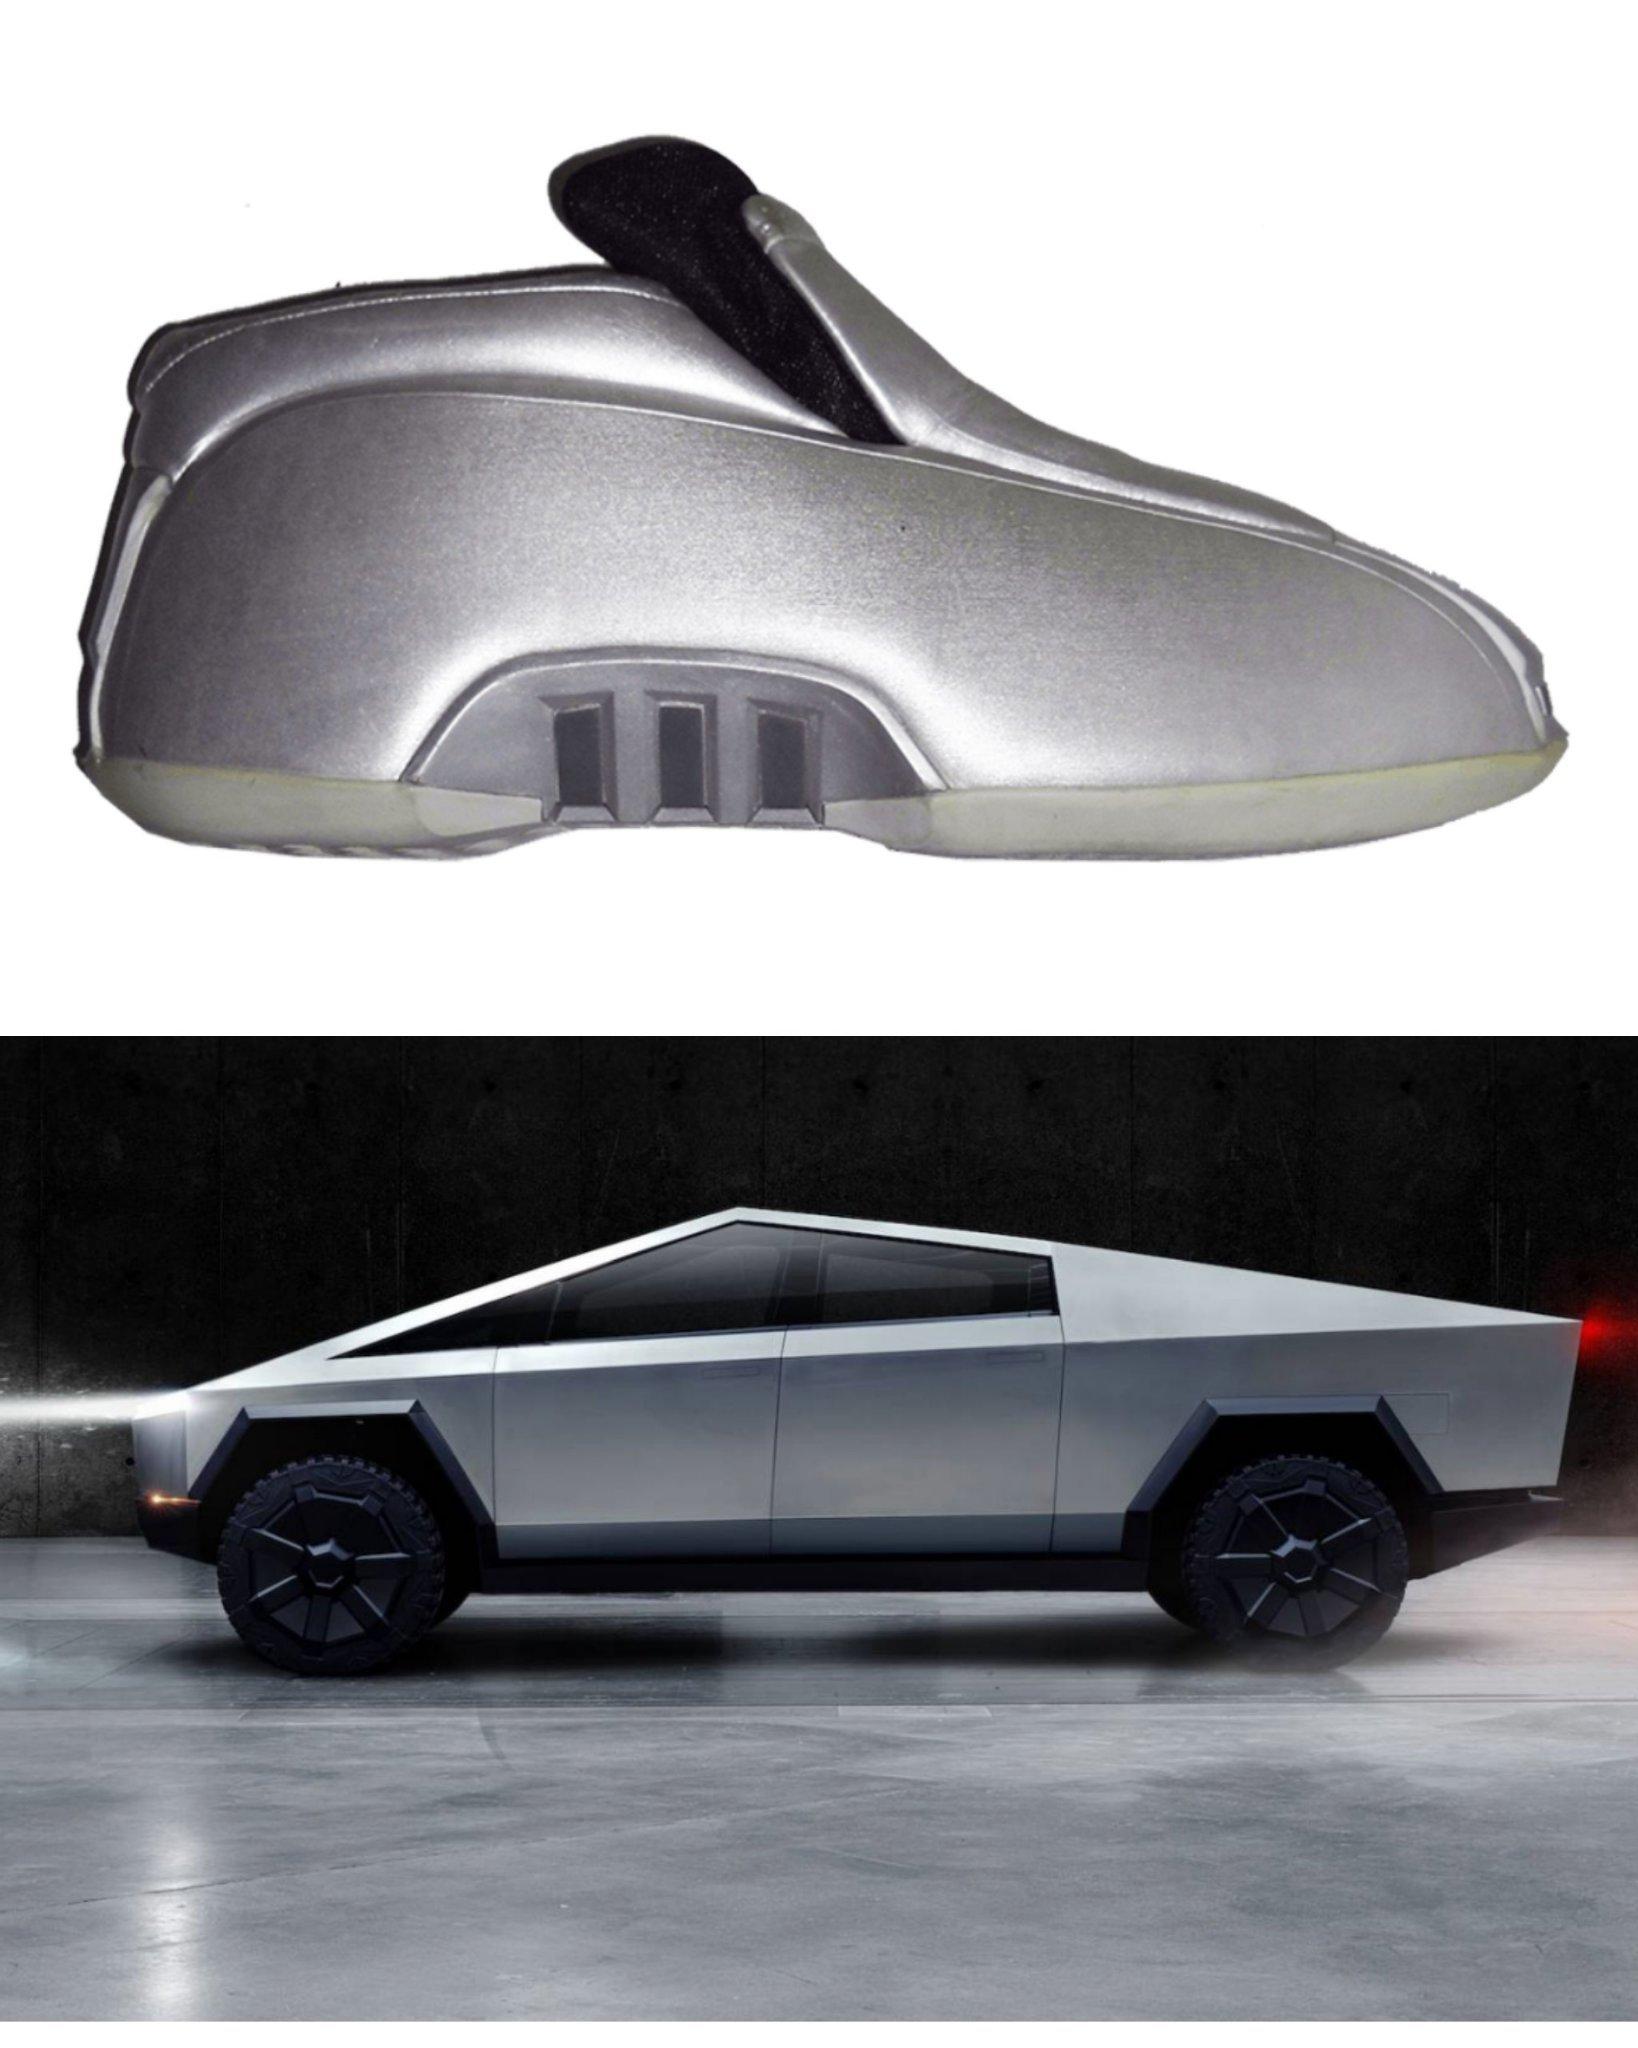 Tesla shoes - meme